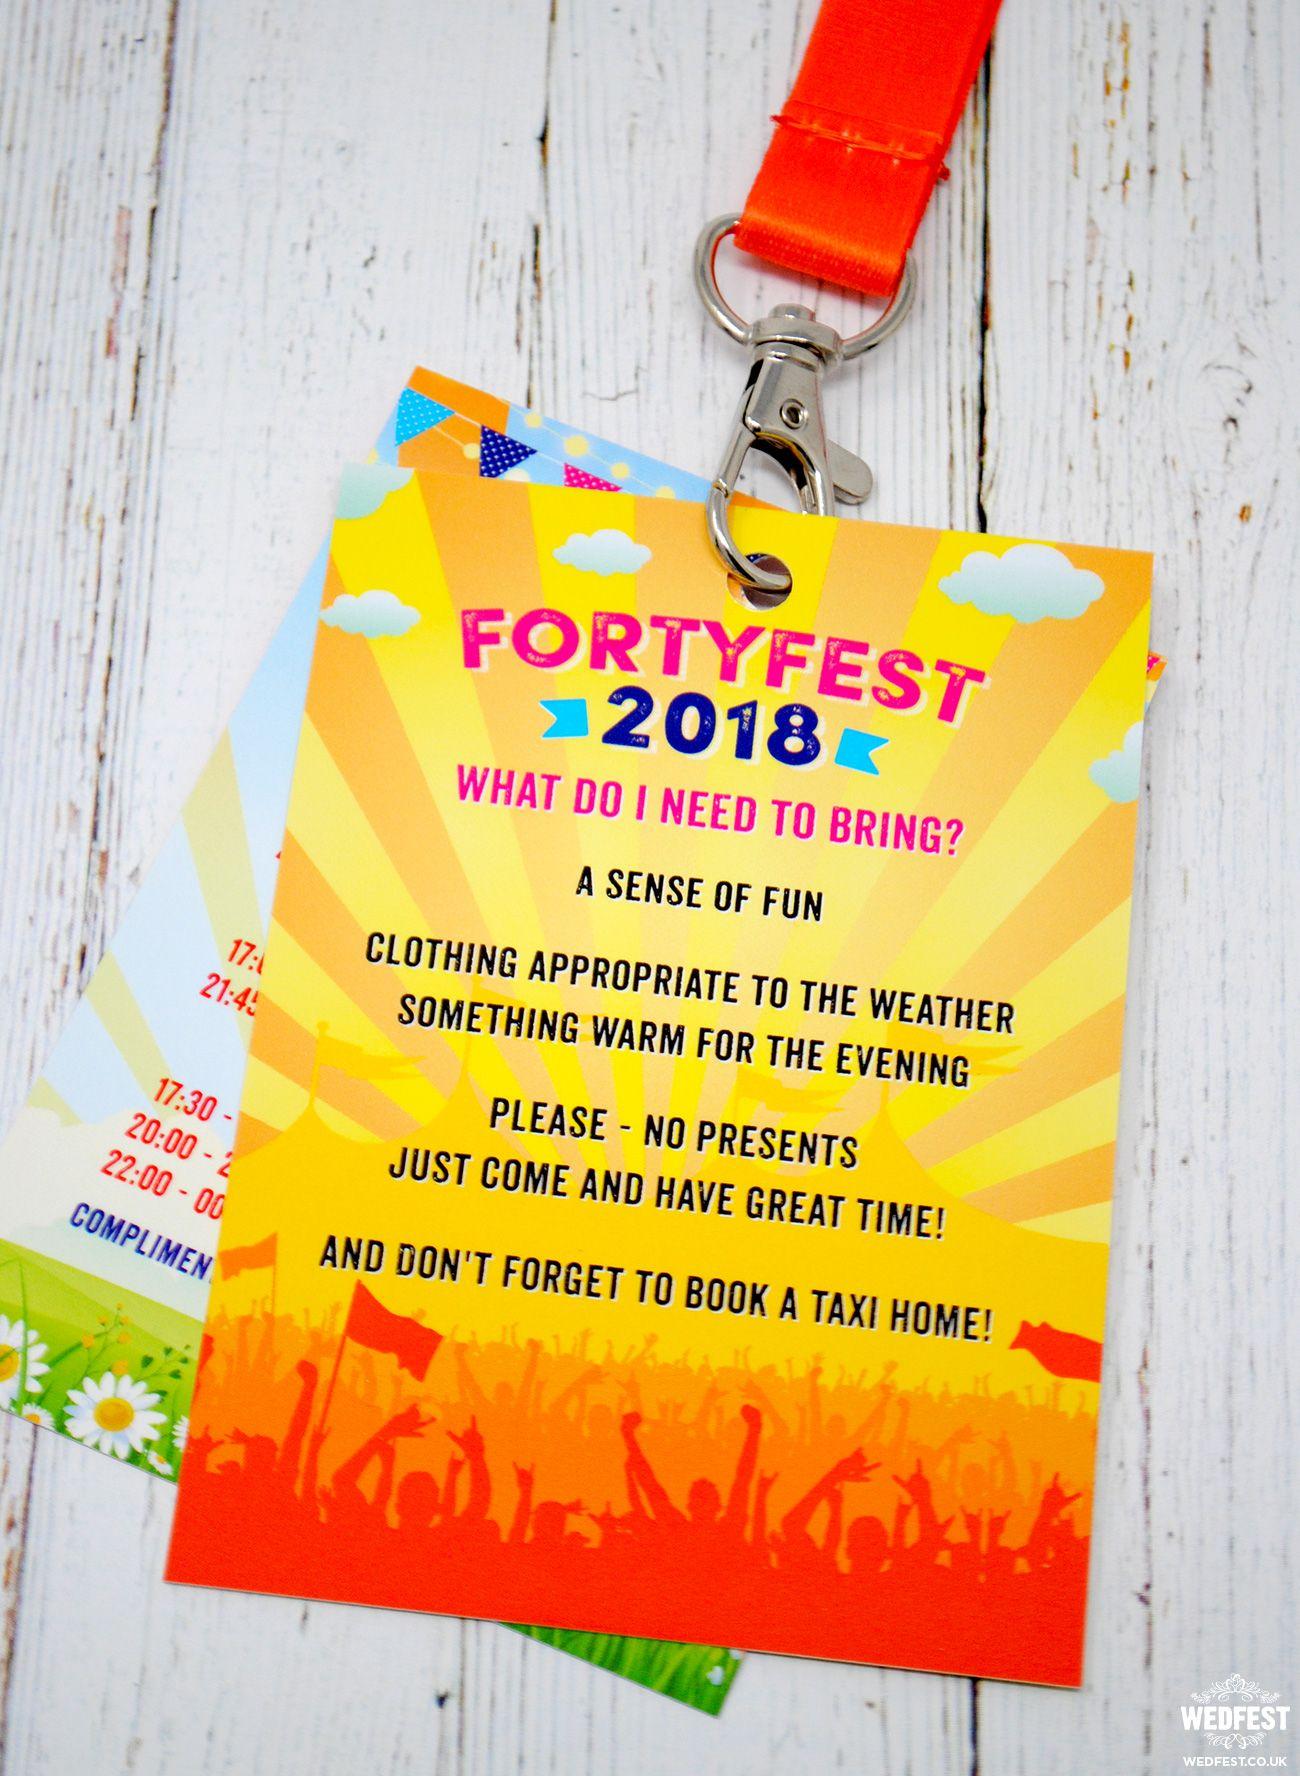 Fortyfest 40th Birthday Party Festival Invitations | WEDFEST